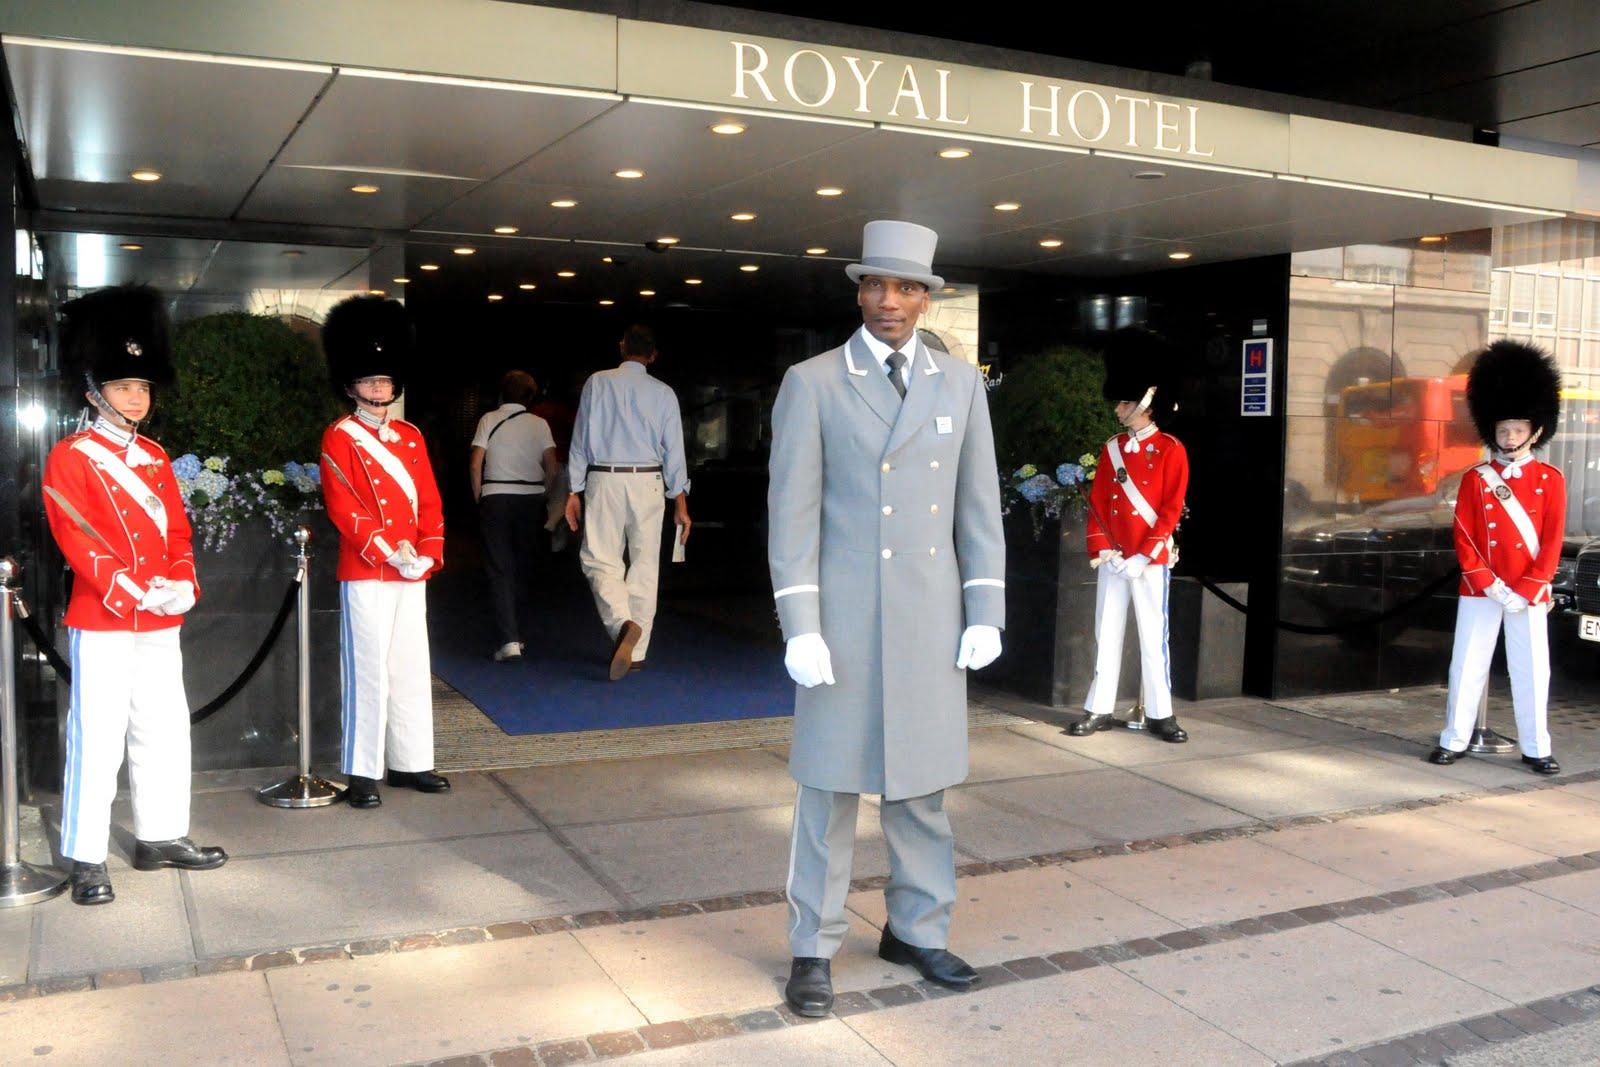 radisson blu royal hotel copenhagen celebrated 50 year s anniversary 1 7 2010. Black Bedroom Furniture Sets. Home Design Ideas